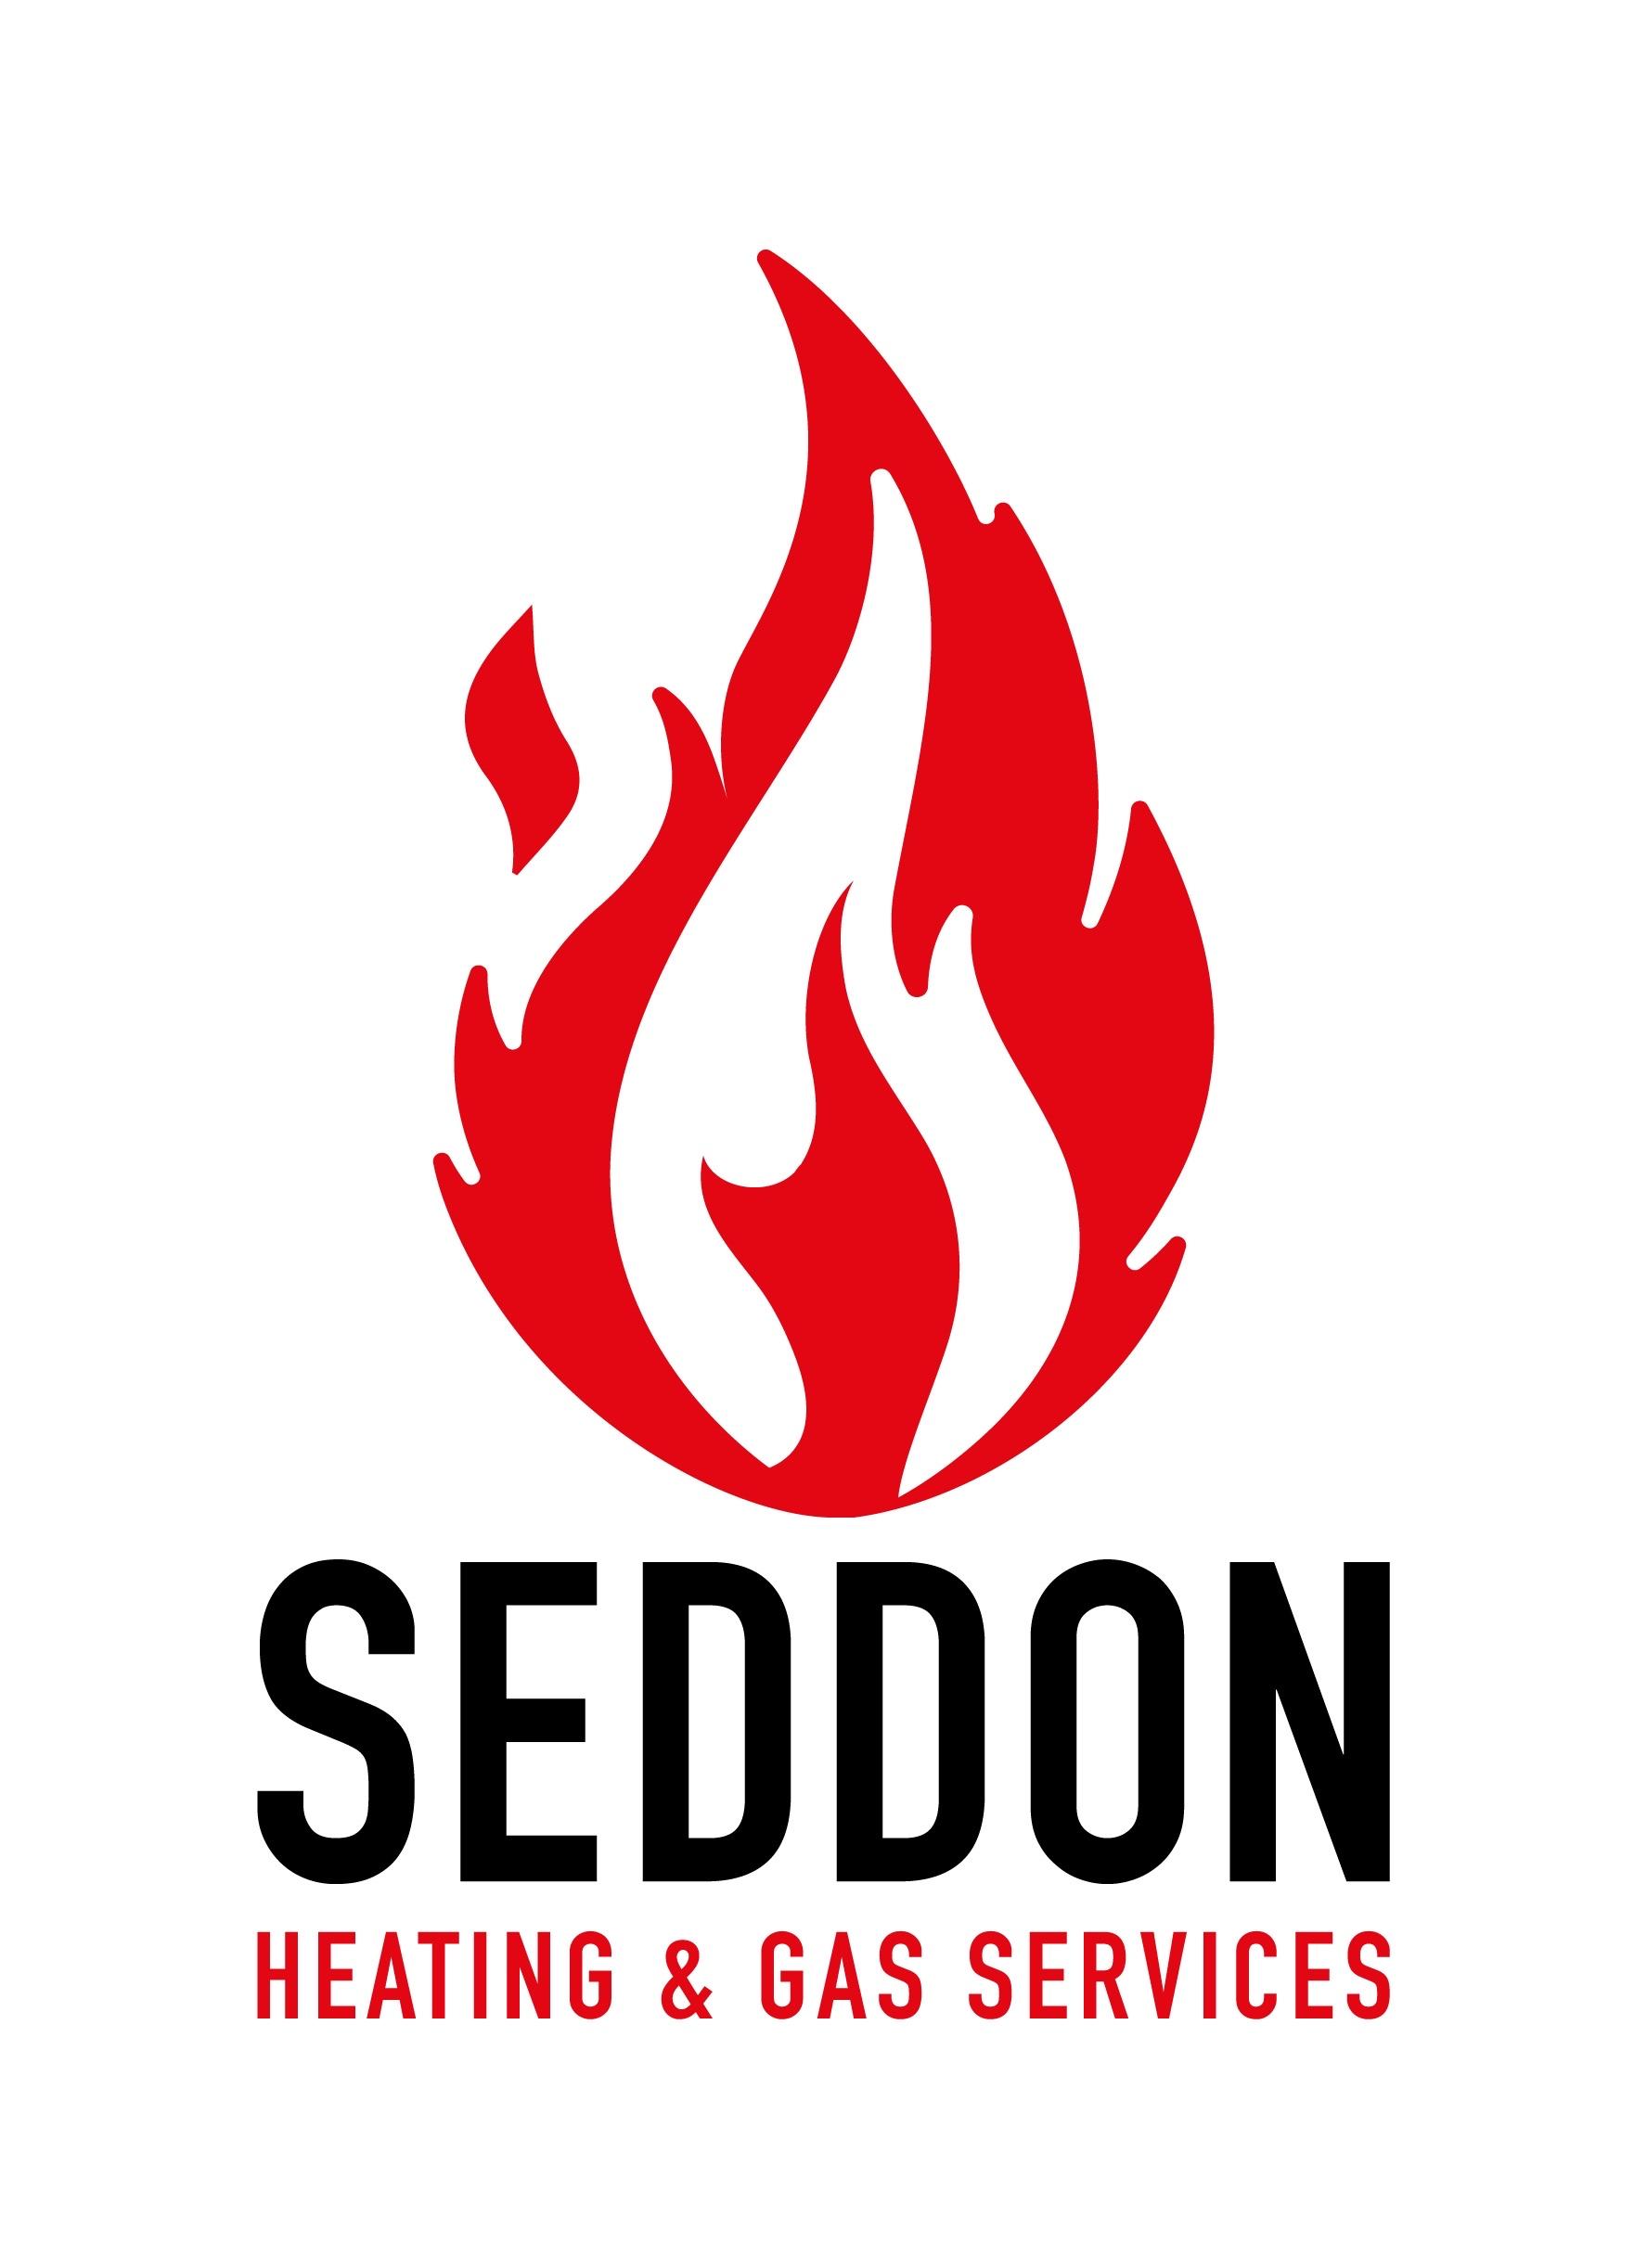 Seddon Heating & Gas Services Verified Logo